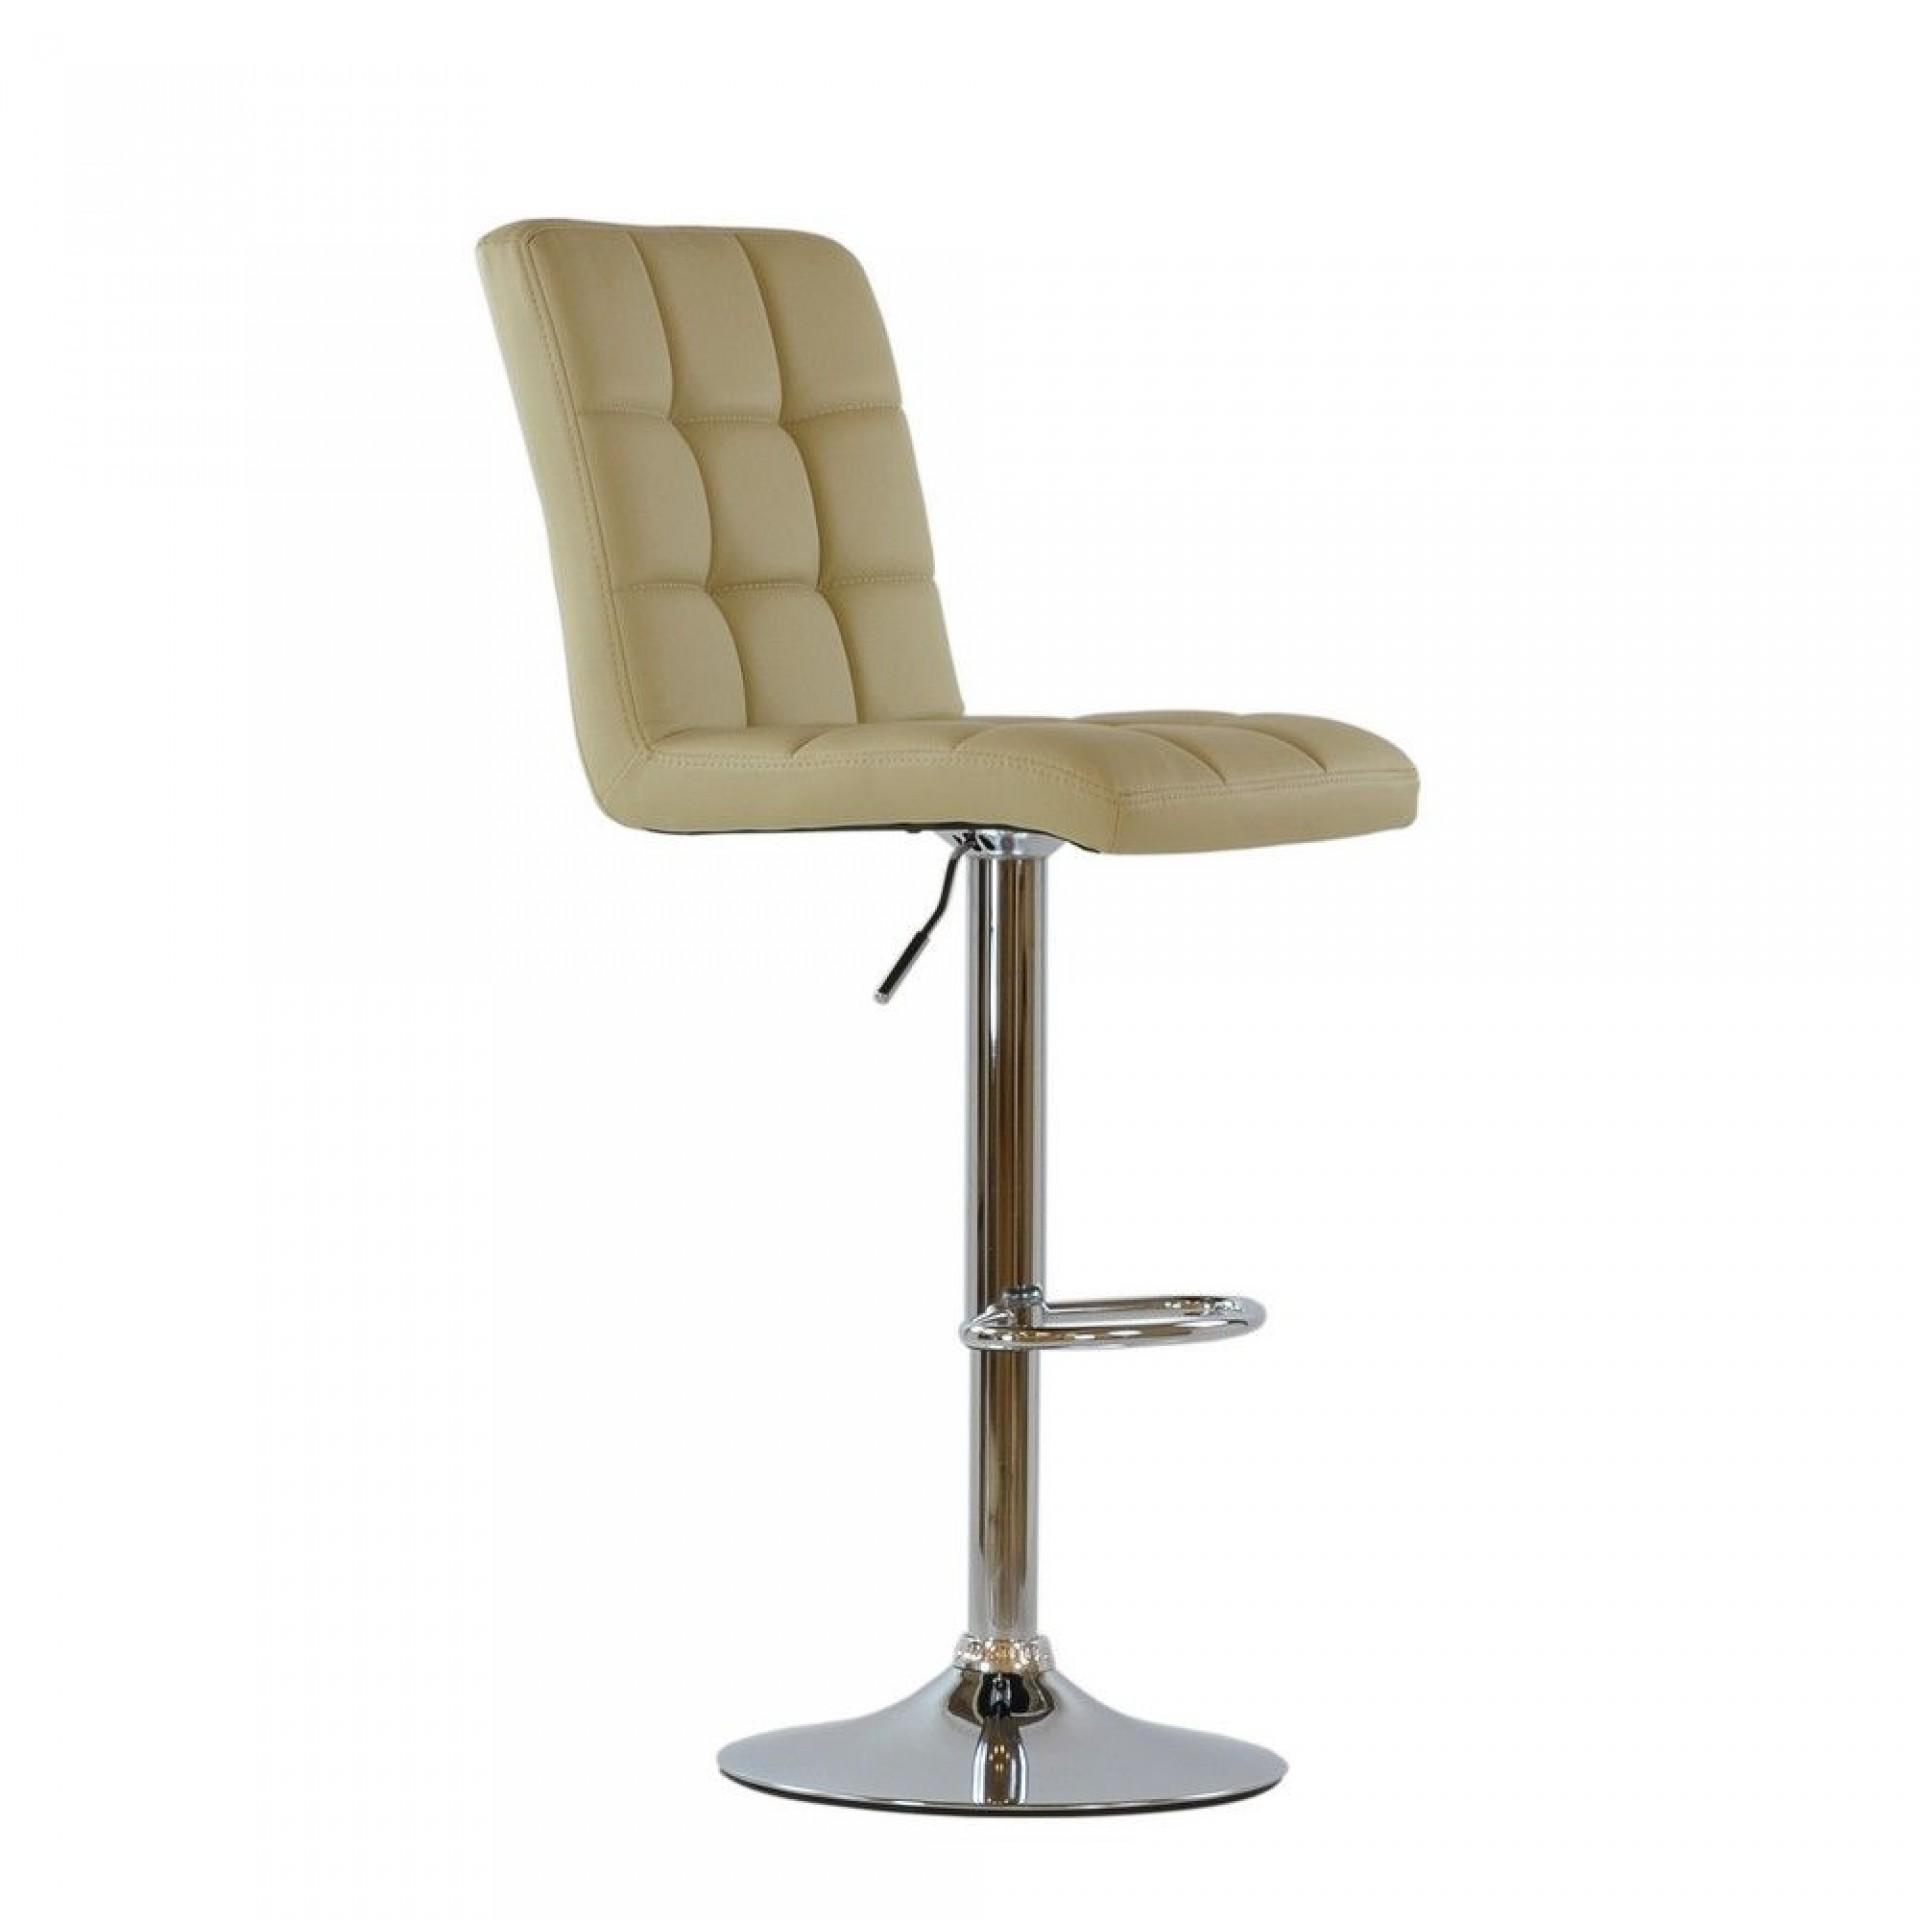 "Барный стул Barneo ""N-48 Kruger"" бежевая кожа"